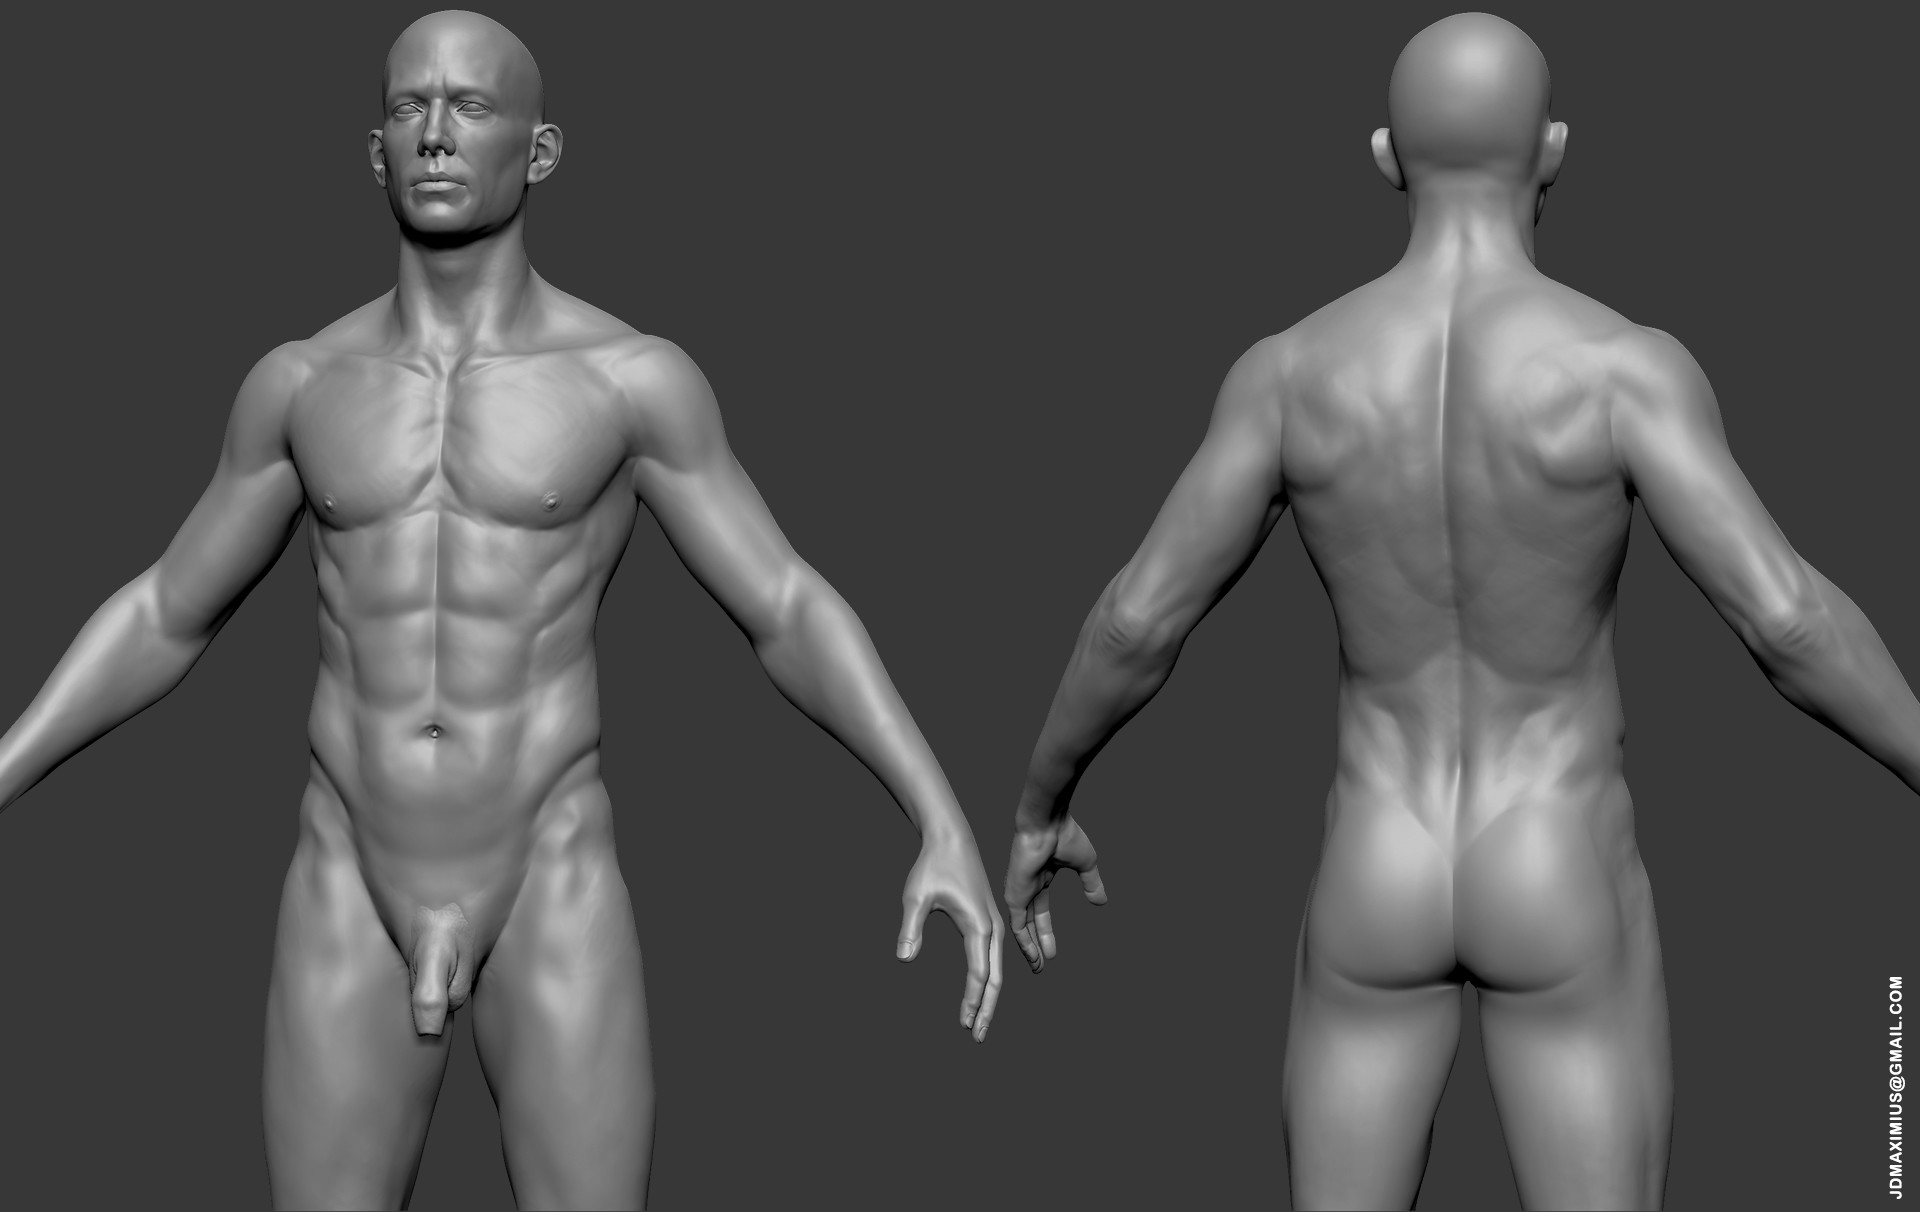 ArtStation - Anatomy Male, Juan Diego Lugo